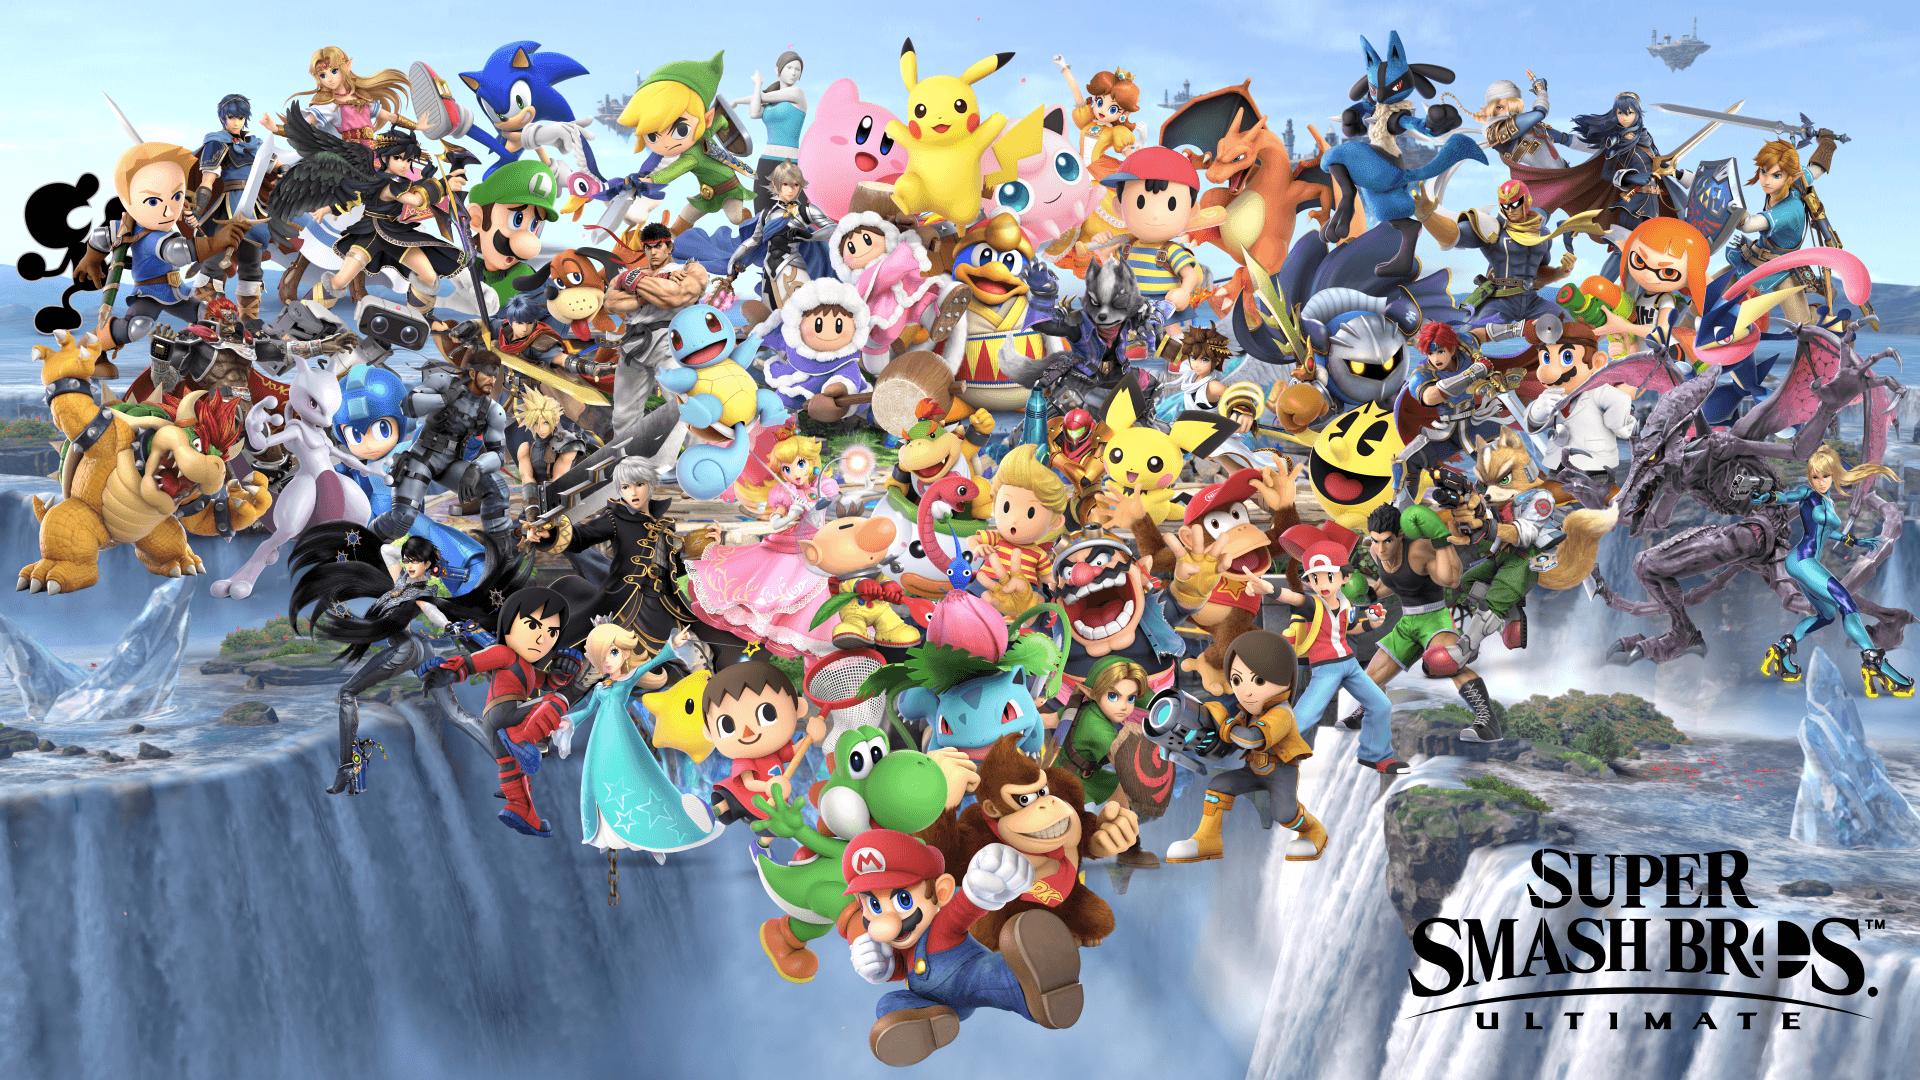 Super Smash Bros Ultimate Wallpapers  Wallpaper Cave